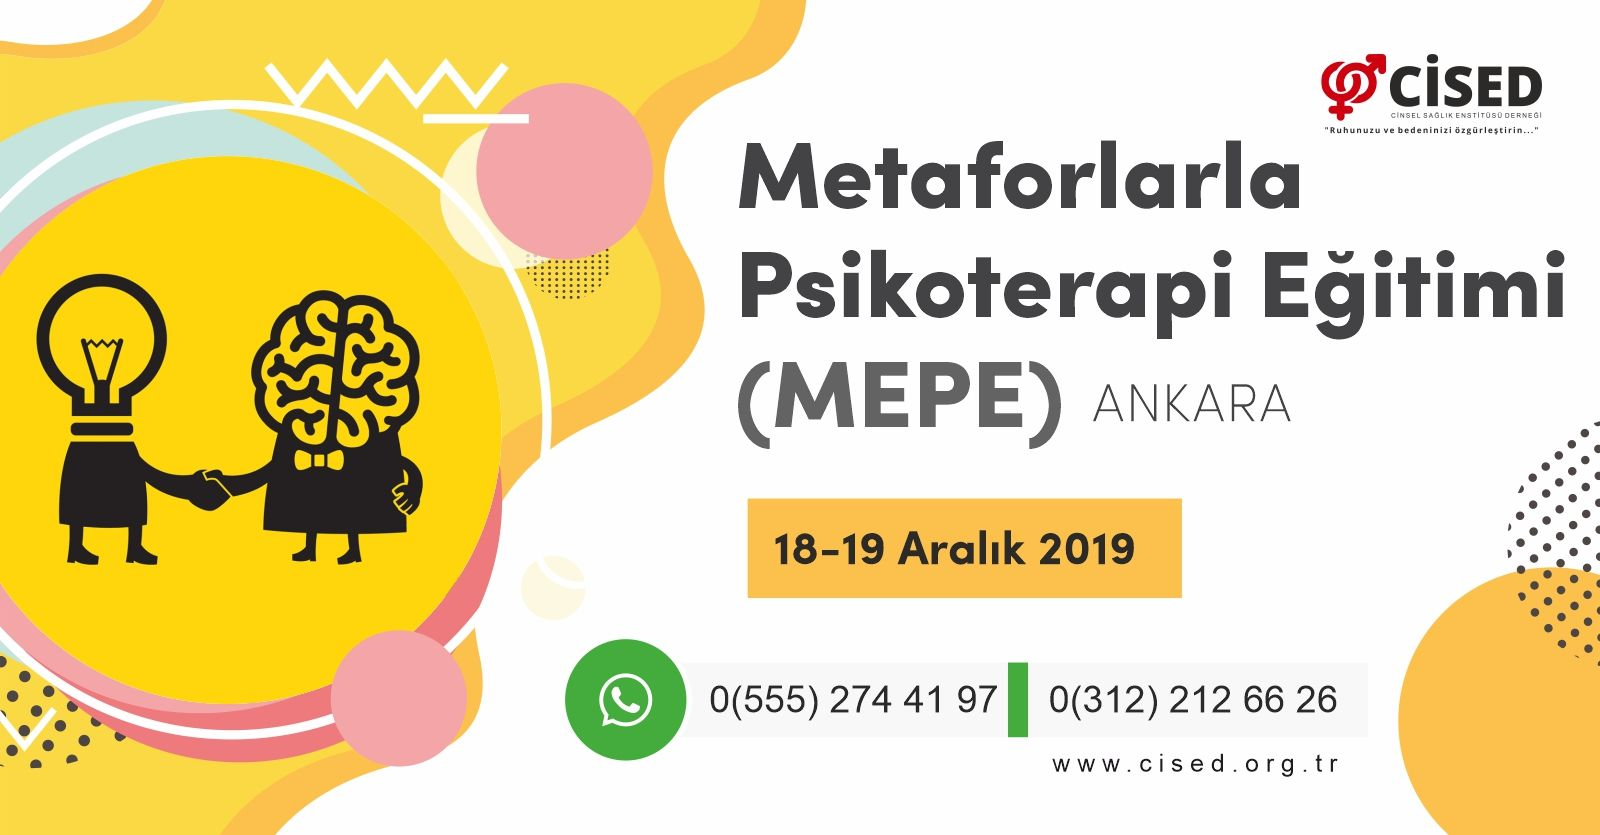 Metaforlarla Psikoterapi Eğitimi (MEPE)